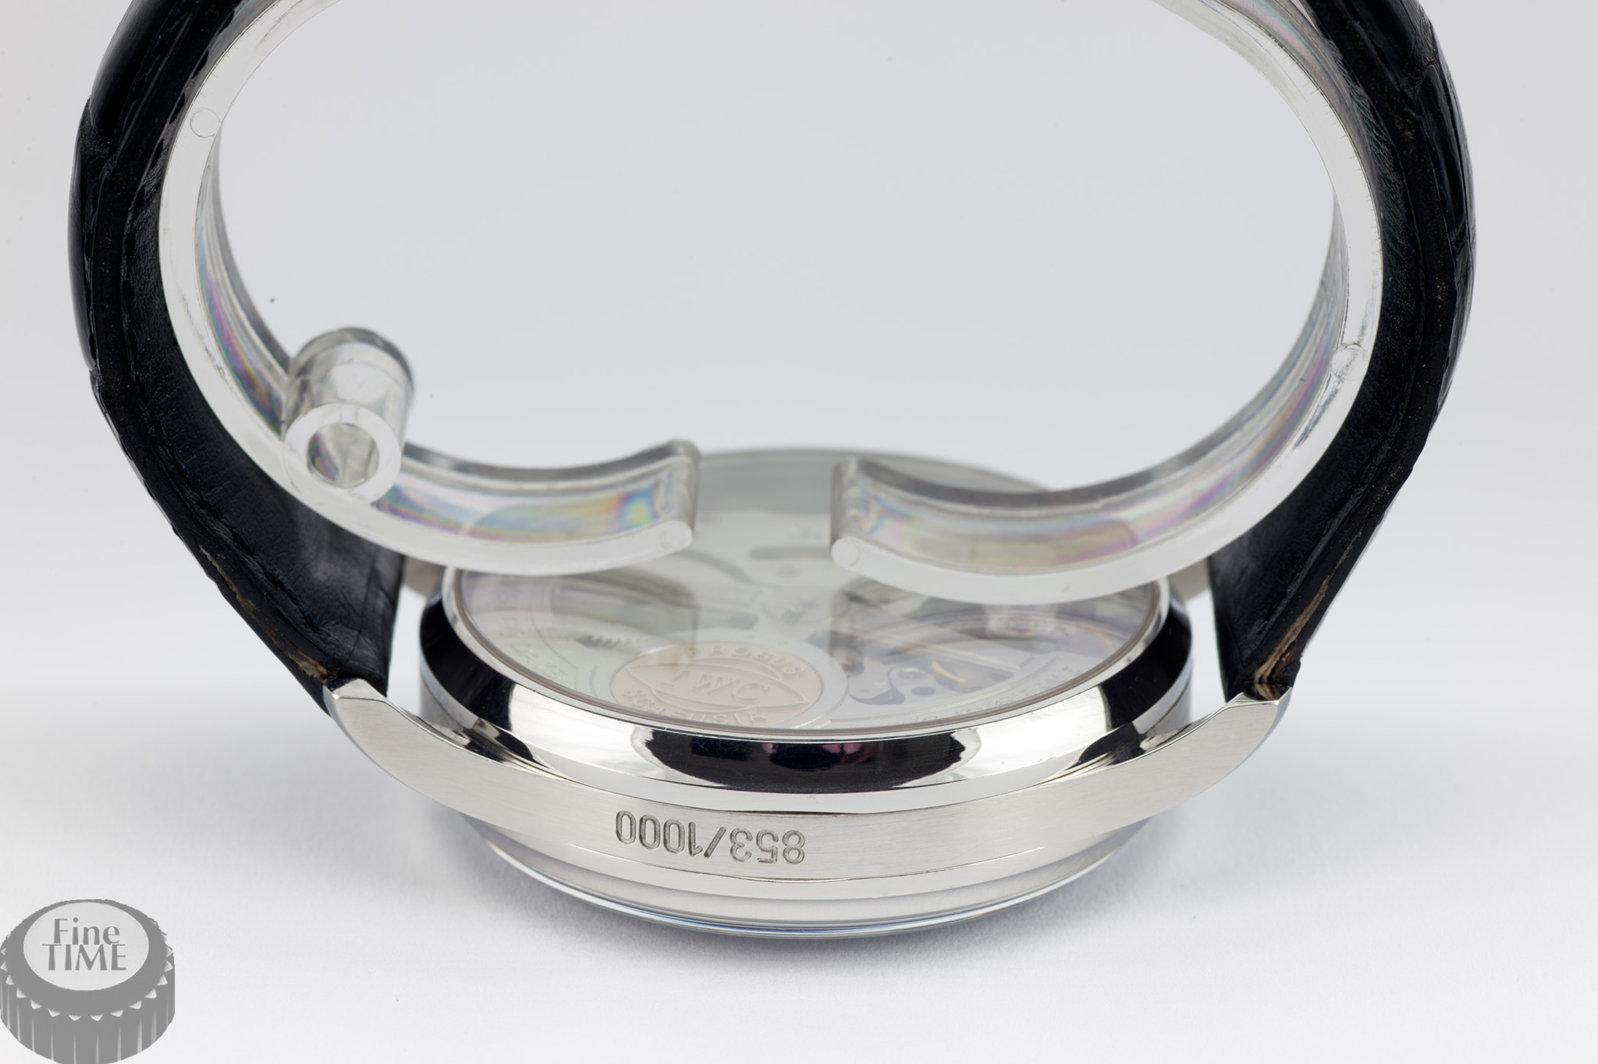 iwc-portuguese-automatic-iw5000-04.jpg